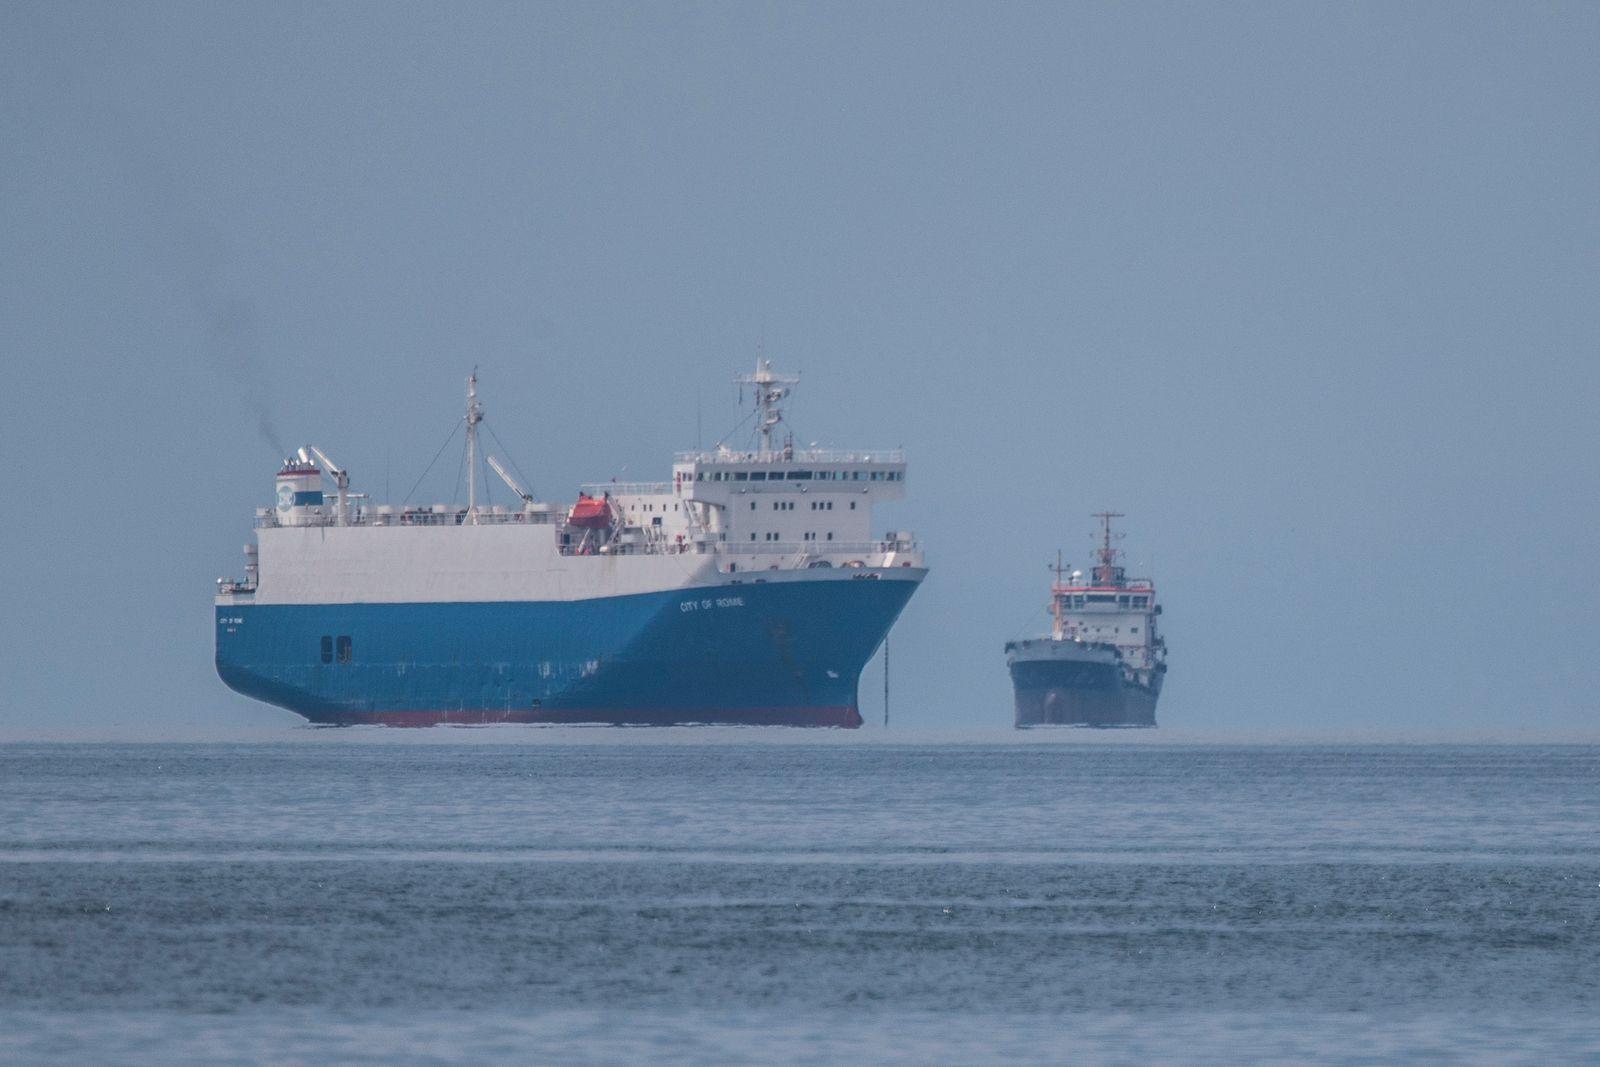 Virus Outbreak Stranded at Sea